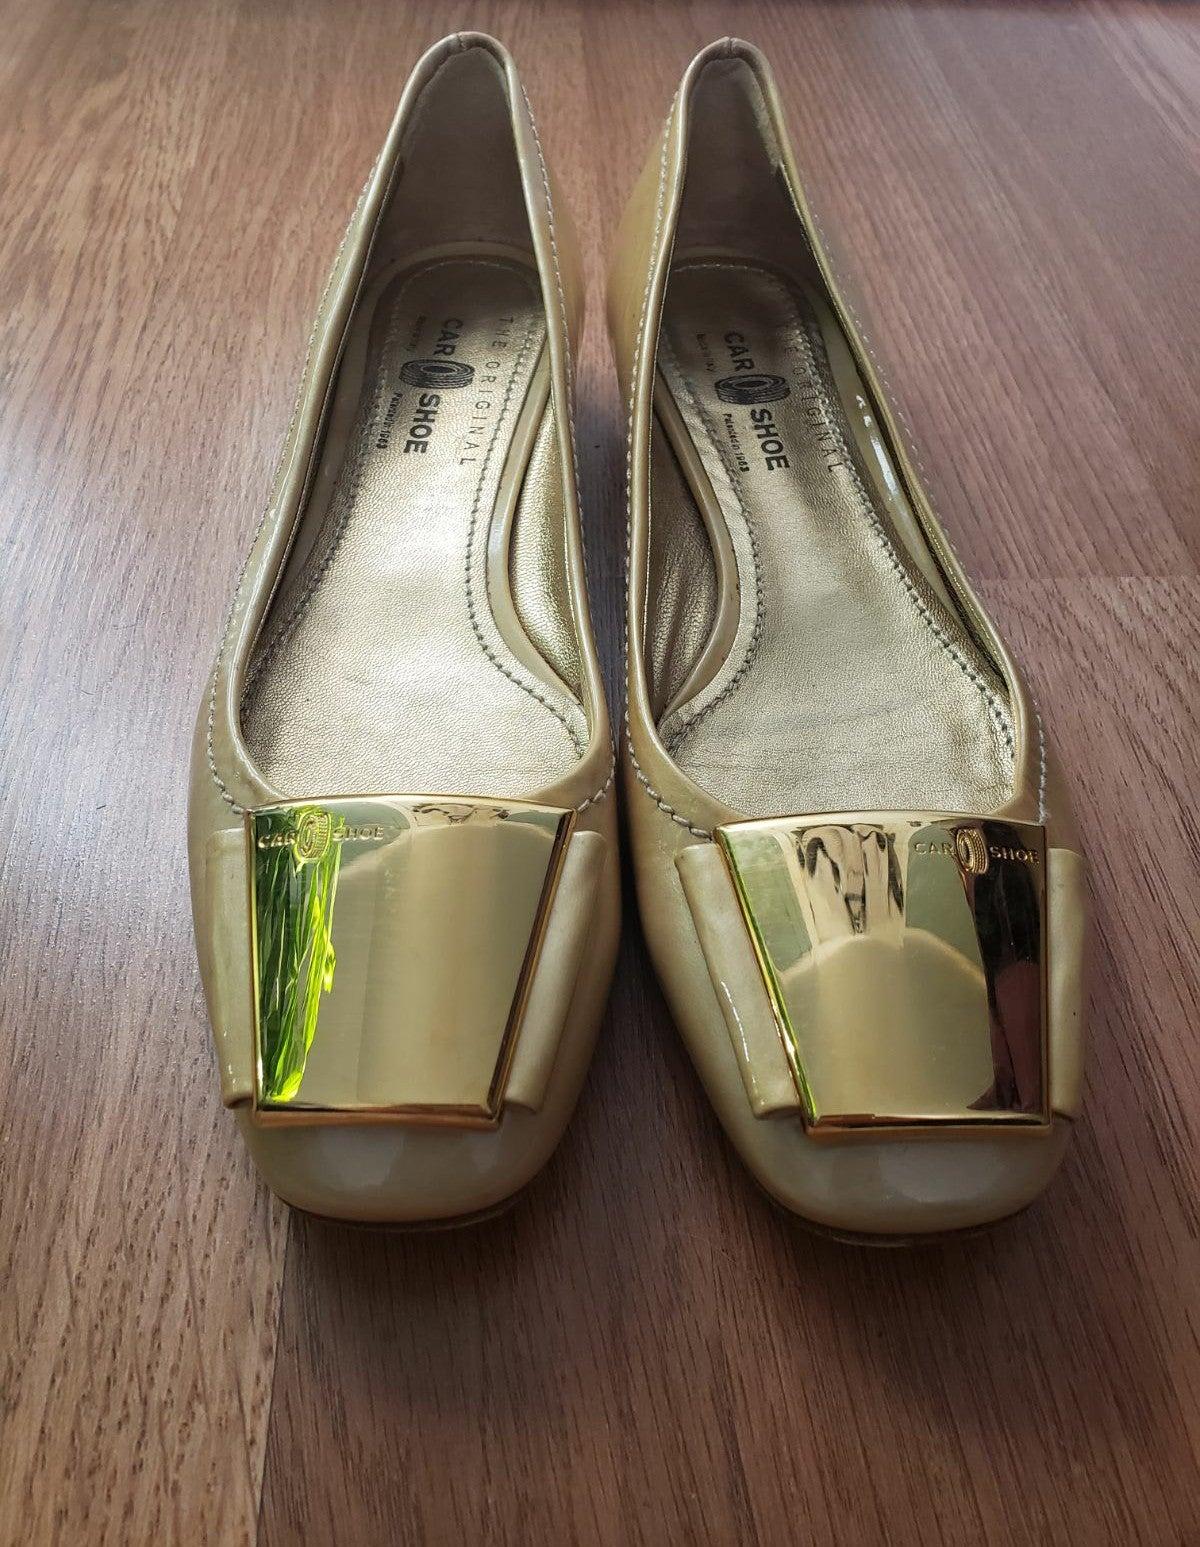 The Original Car Shoe Gold Flats 37.5 7